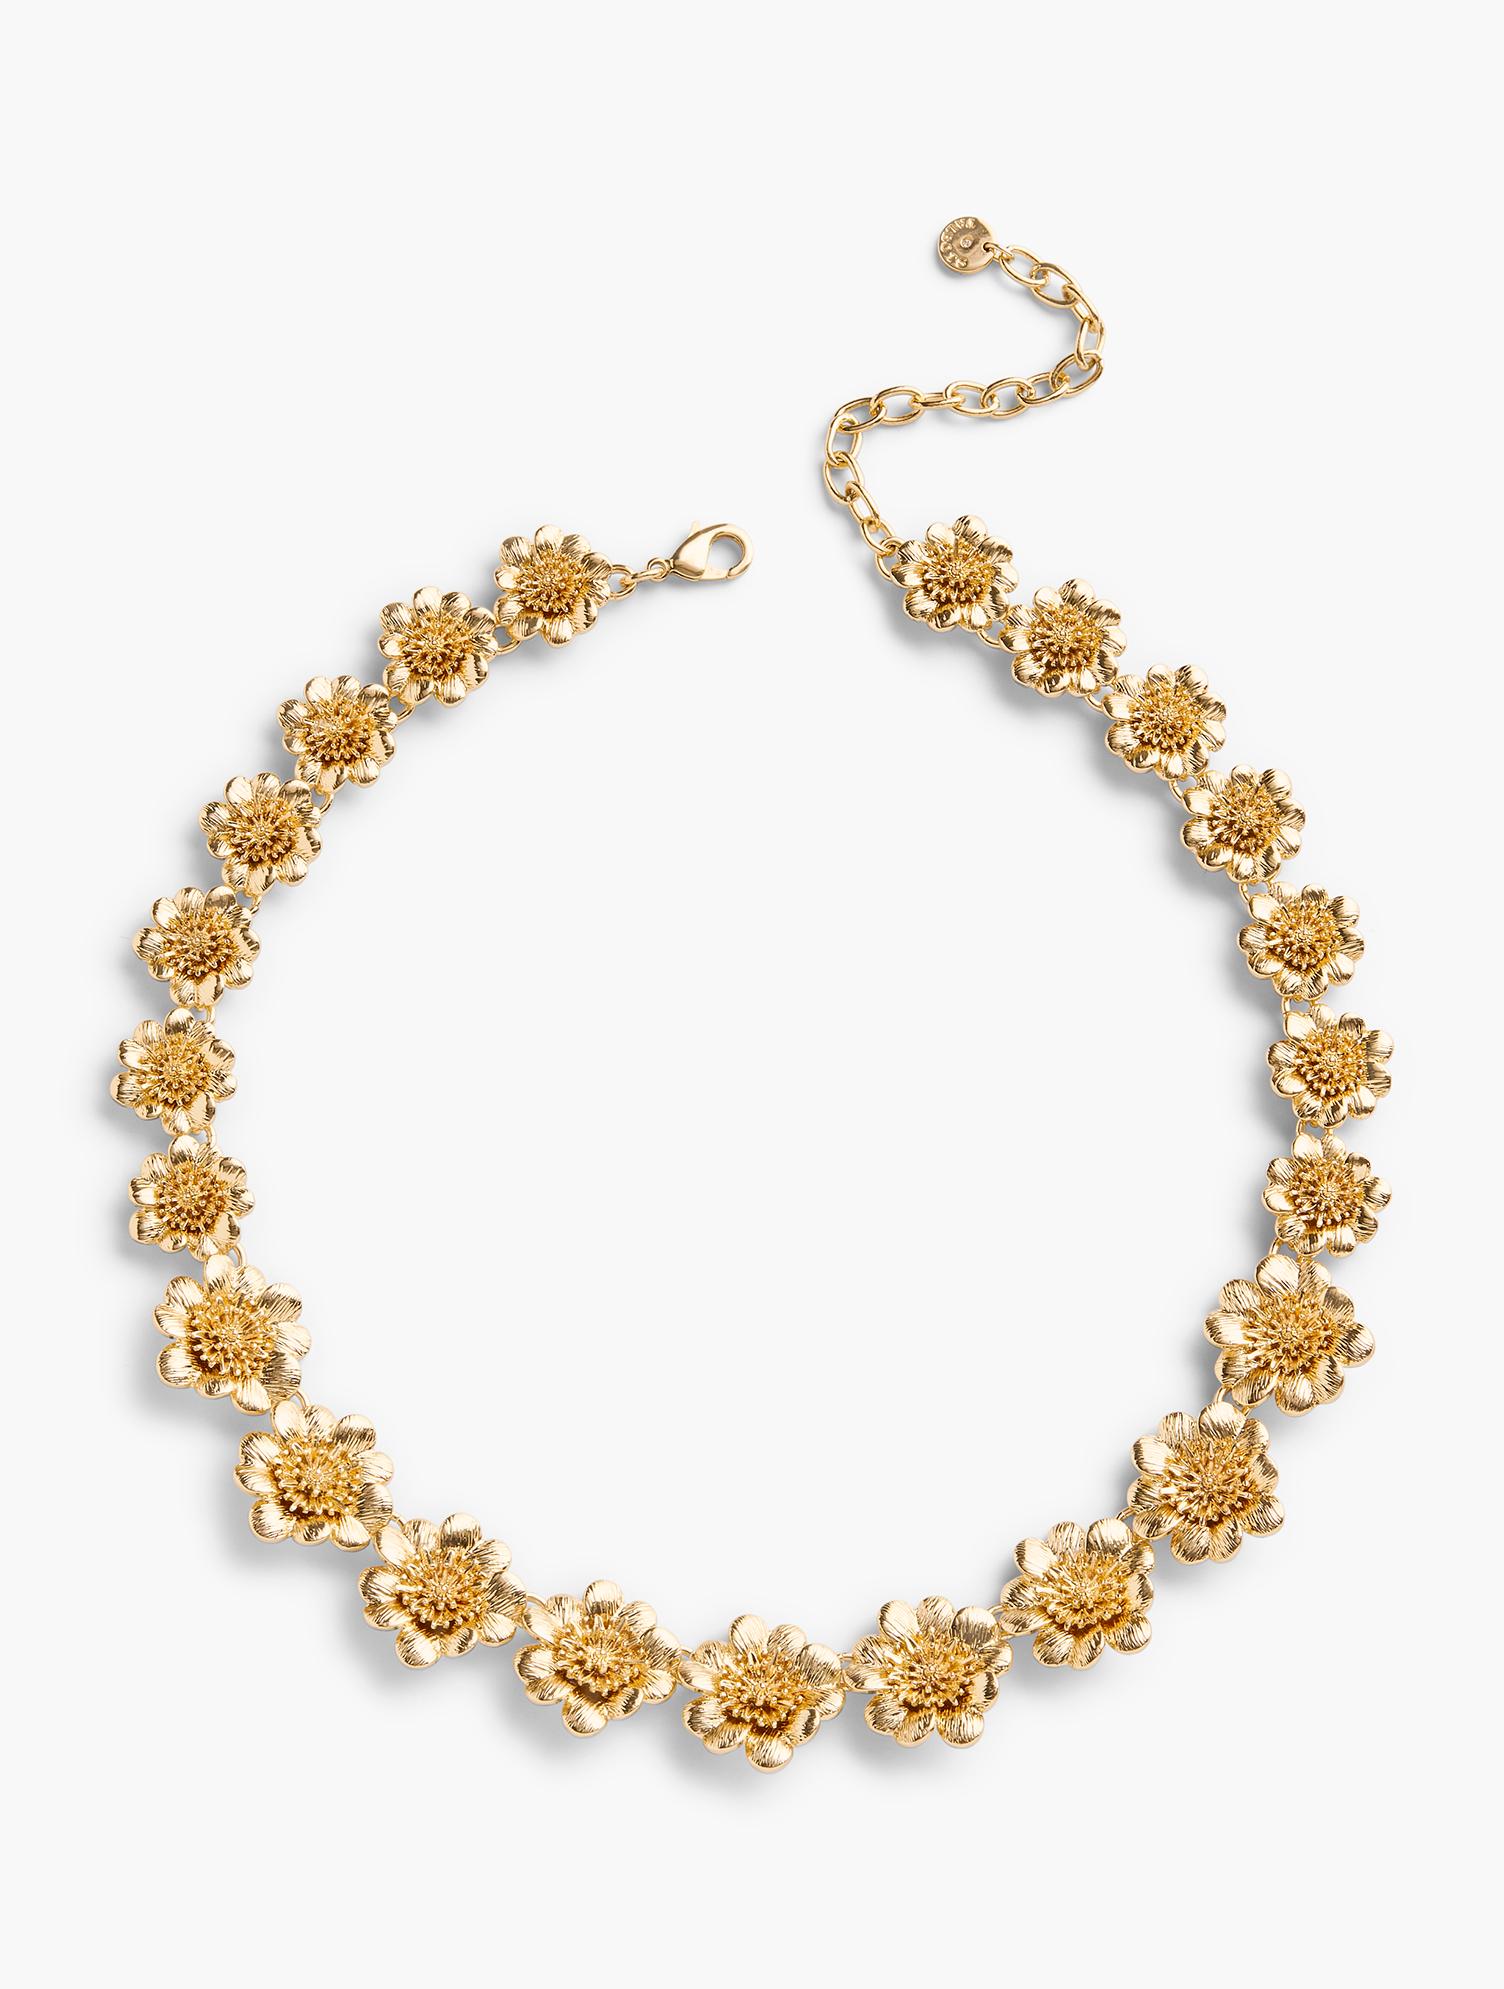 50s Jewelry: Earrings, Necklace, Brooch, Bracelet Short Flower-bud Necklace - GOLD - OS - Talbots $79.50 AT vintagedancer.com